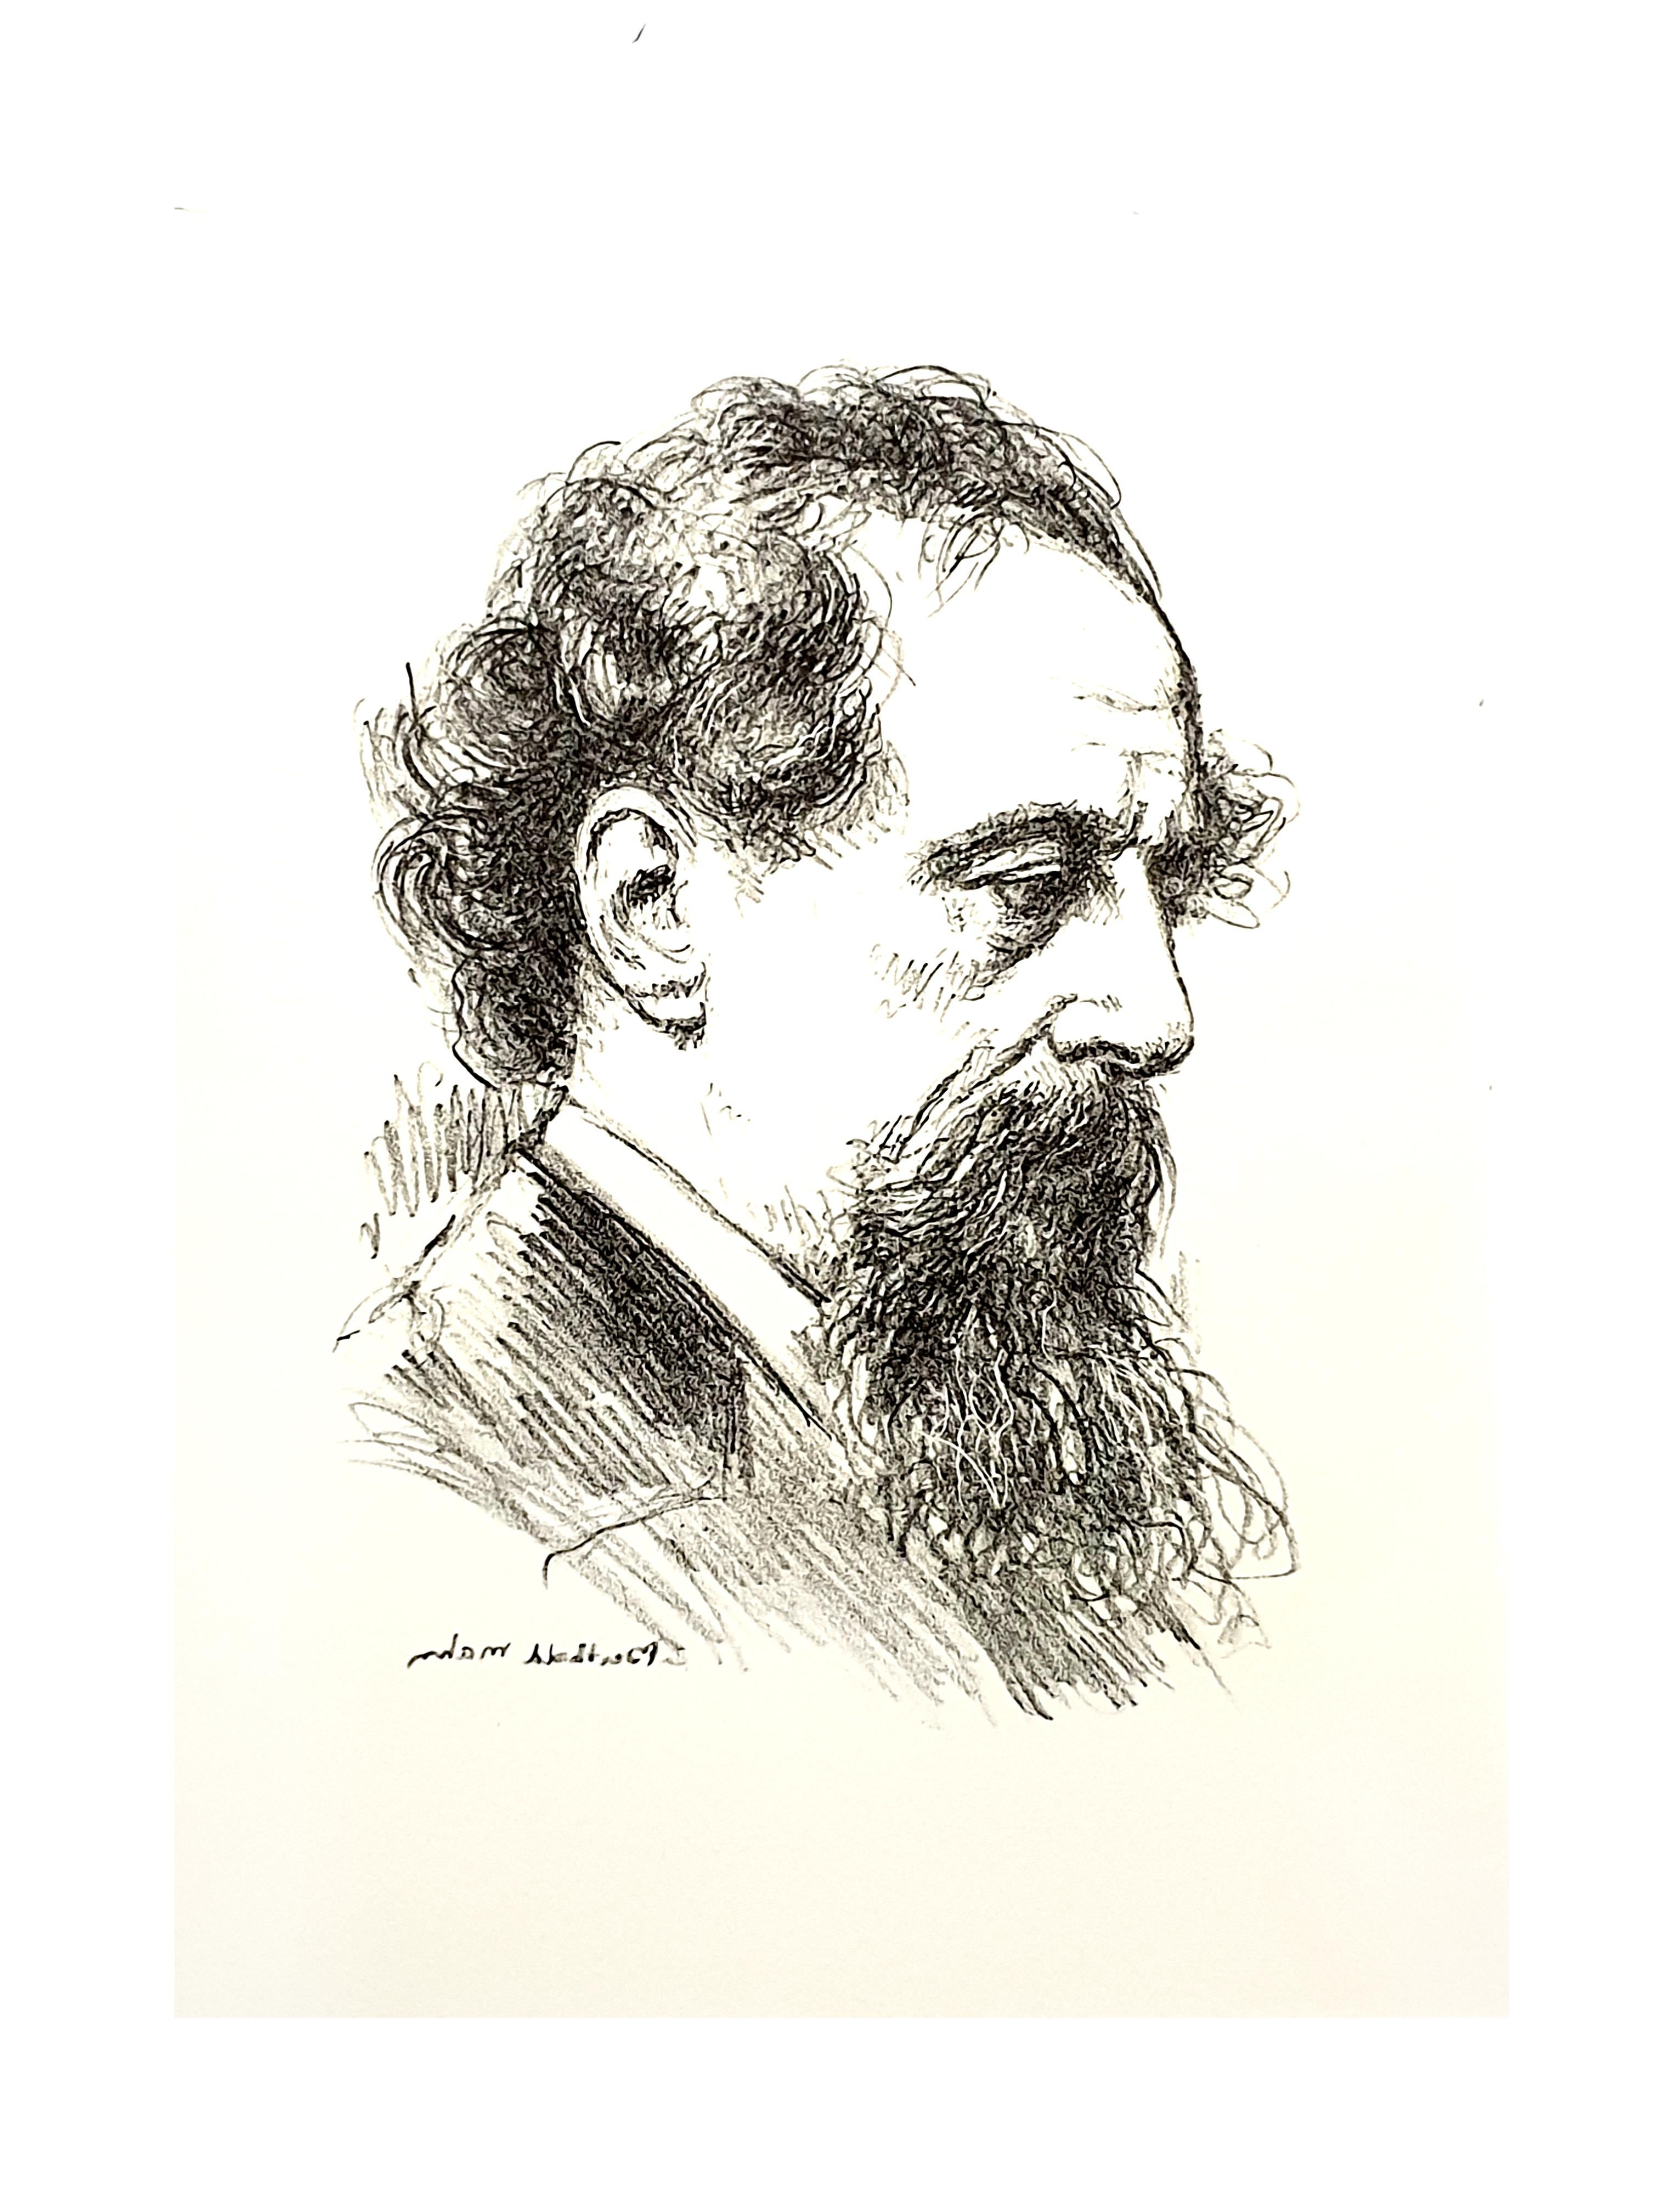 Berthold Mahn - Portrait - Original Lithograph